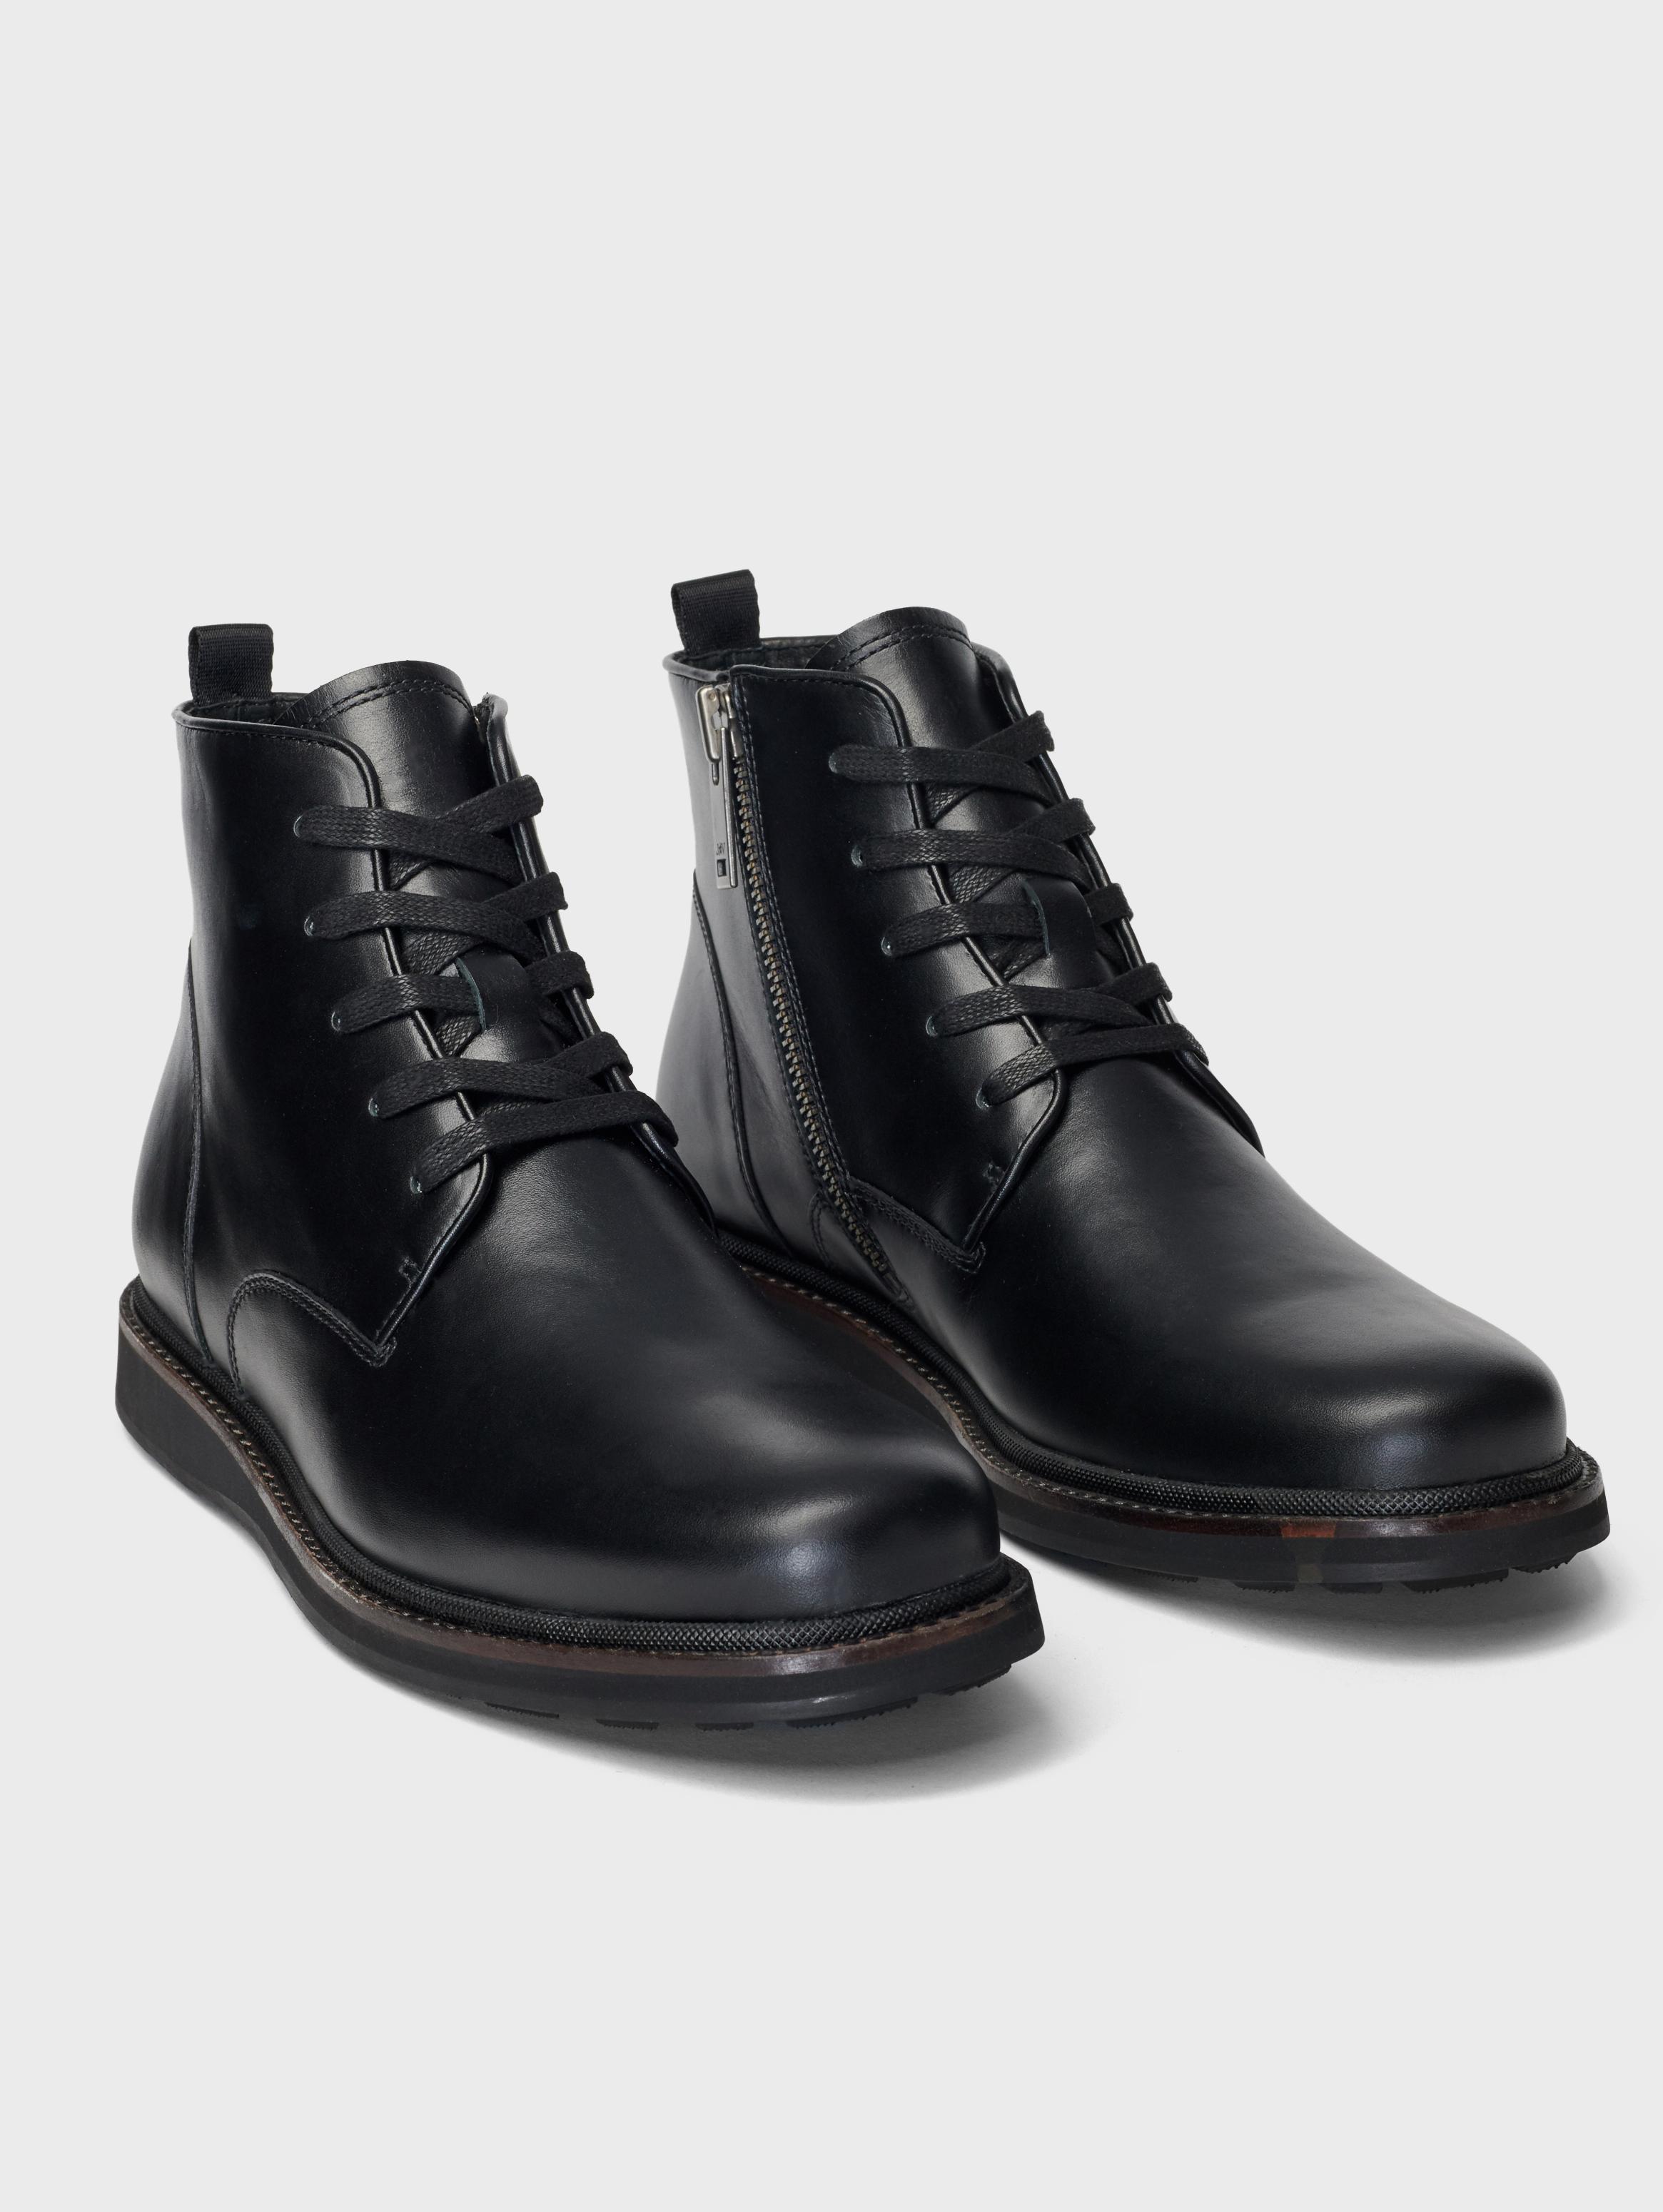 John Varvatos Brooklyn Lug Lace Boots Charcoal